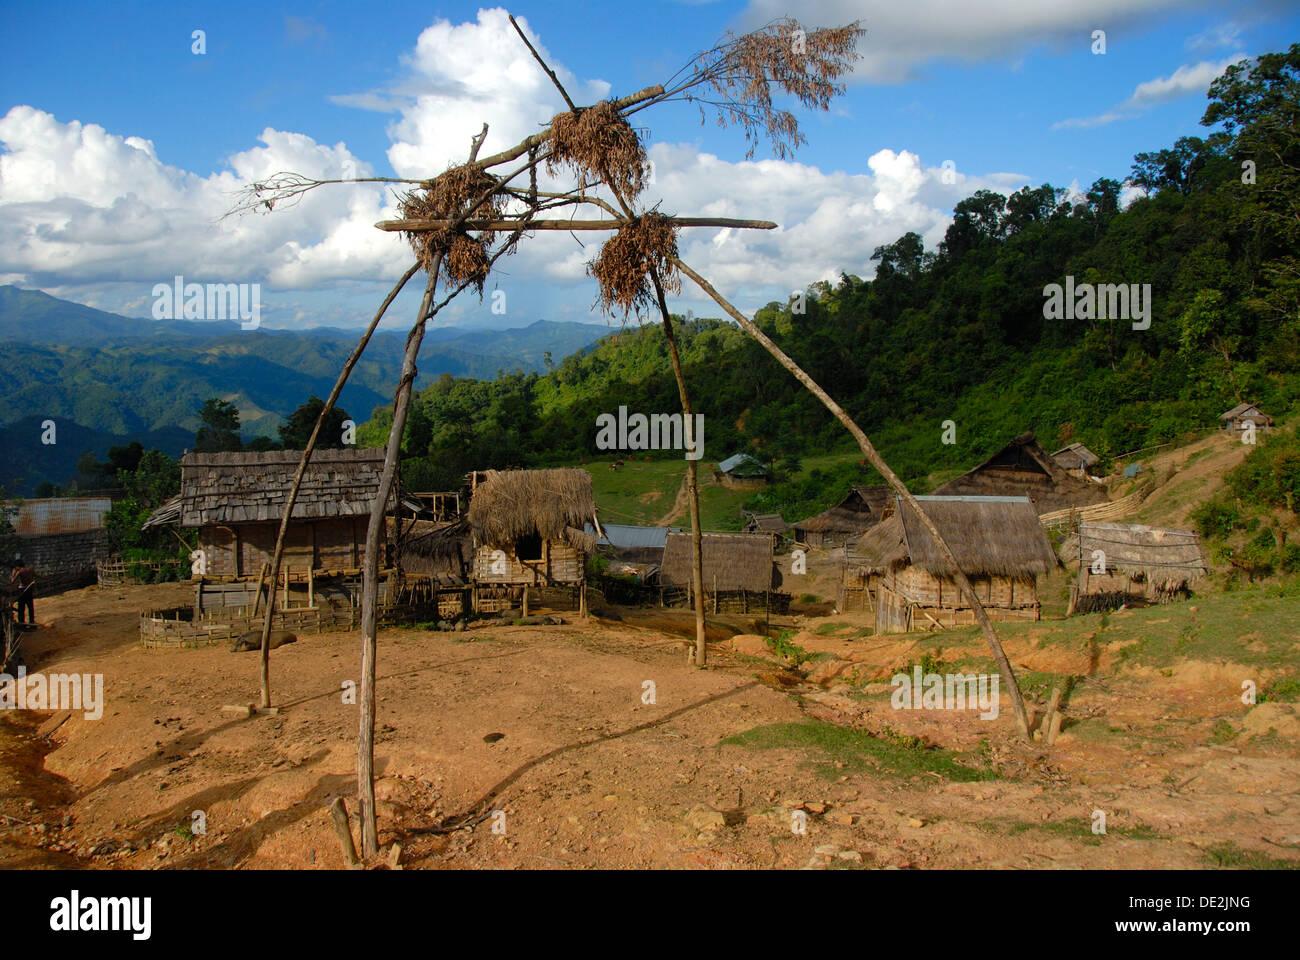 Armut, Naturreligion, Animismus, der Glaube an Geister glauben an Geister, Geister Schaukel am Eingang Dorfes, Dorf der Stockbild